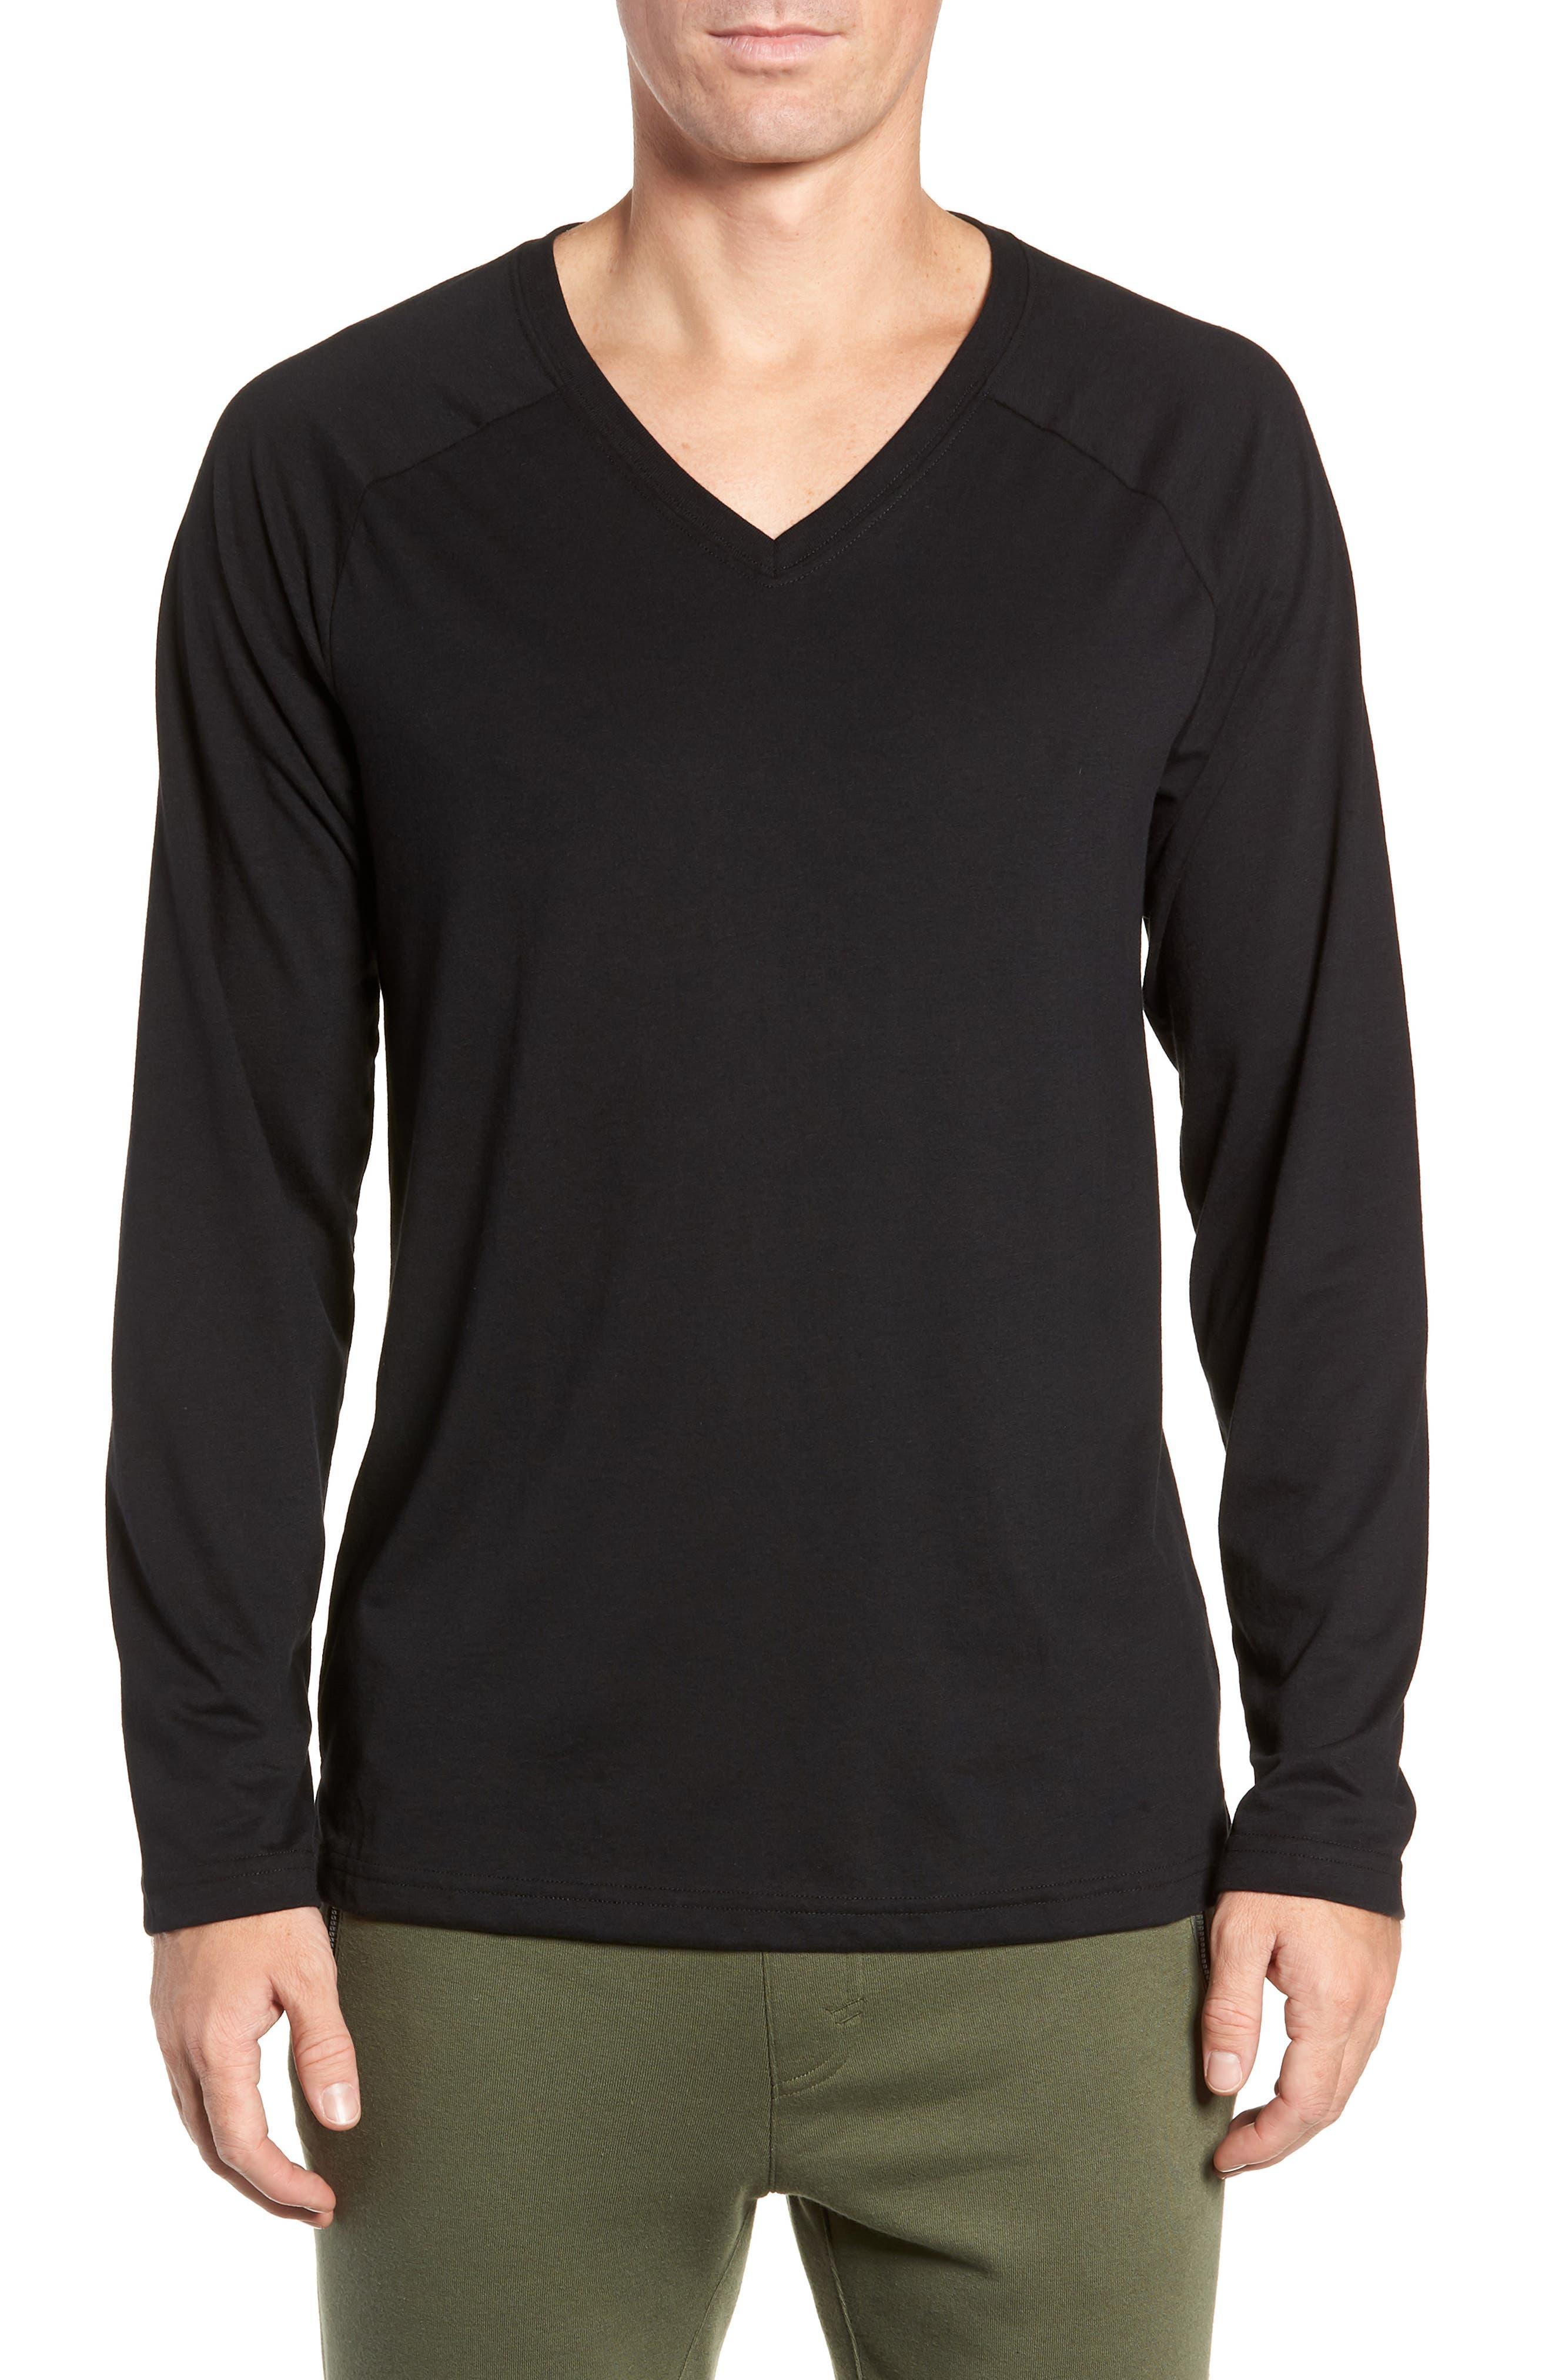 ALO, Triumph Long Raglan Sleeve V-Neck T-Shirt, Main thumbnail 1, color, SOLID BLACK TRIBLEND